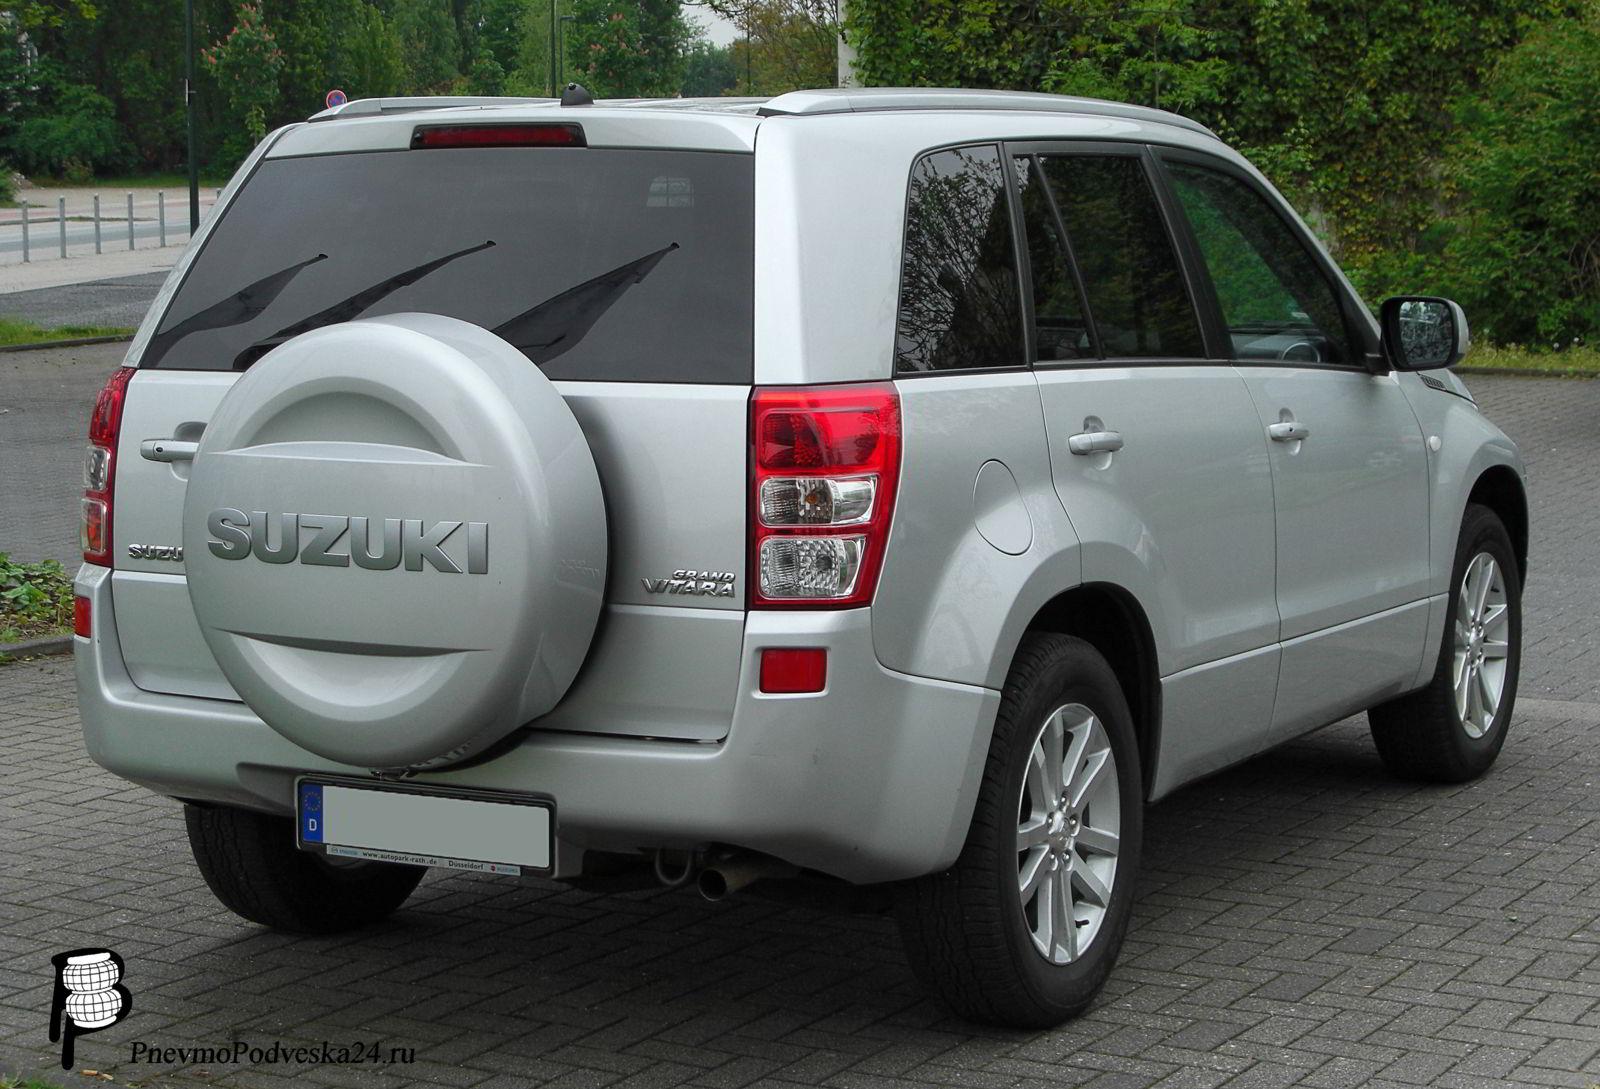 Пневмоподвеска на Сузуки Гранд Витара (Suzuki Grand Vitara) задняя.